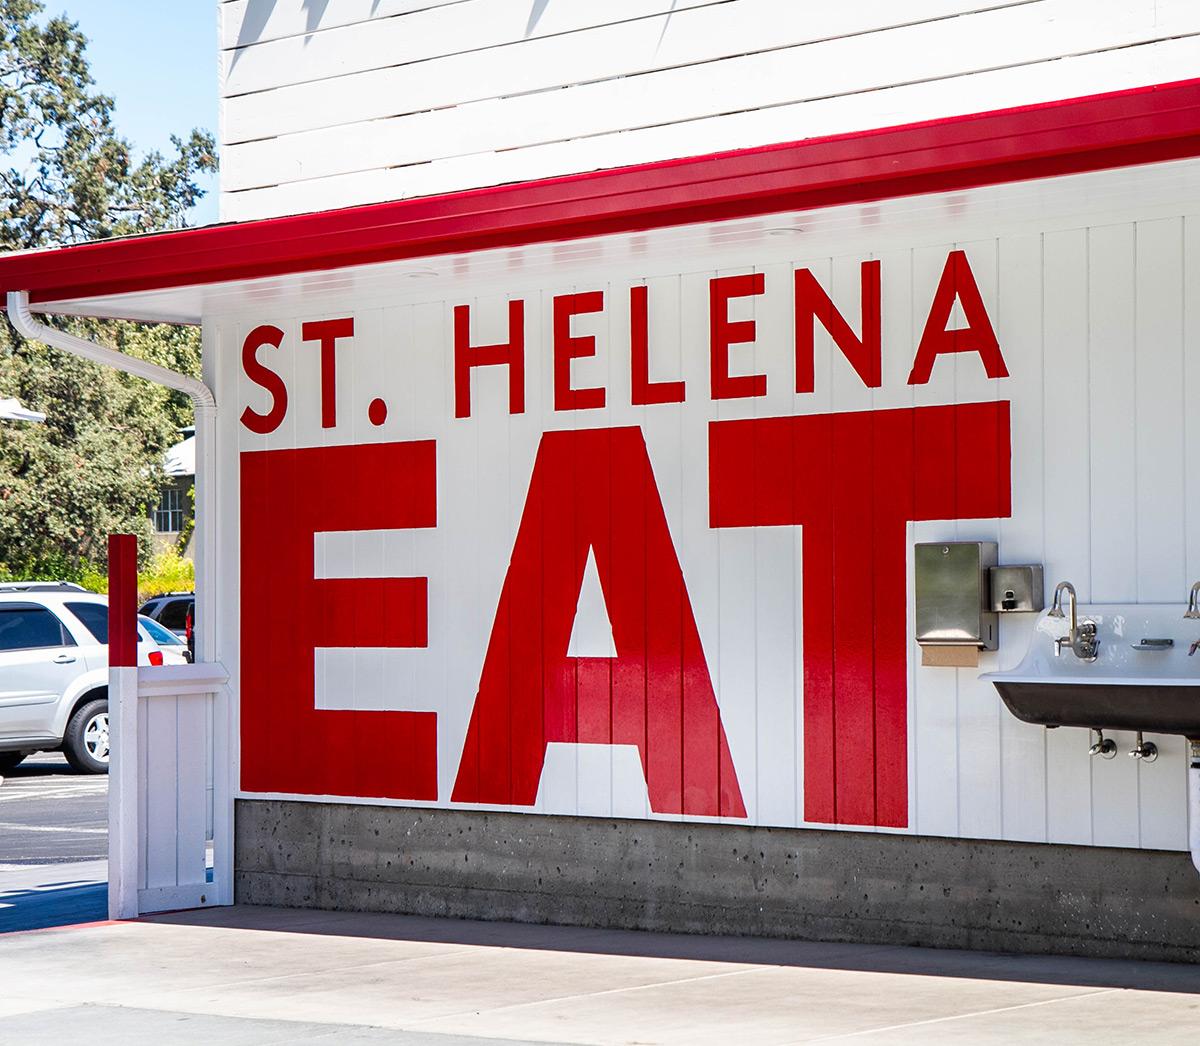 San Francisco Food - Gott's - St. Helena, California